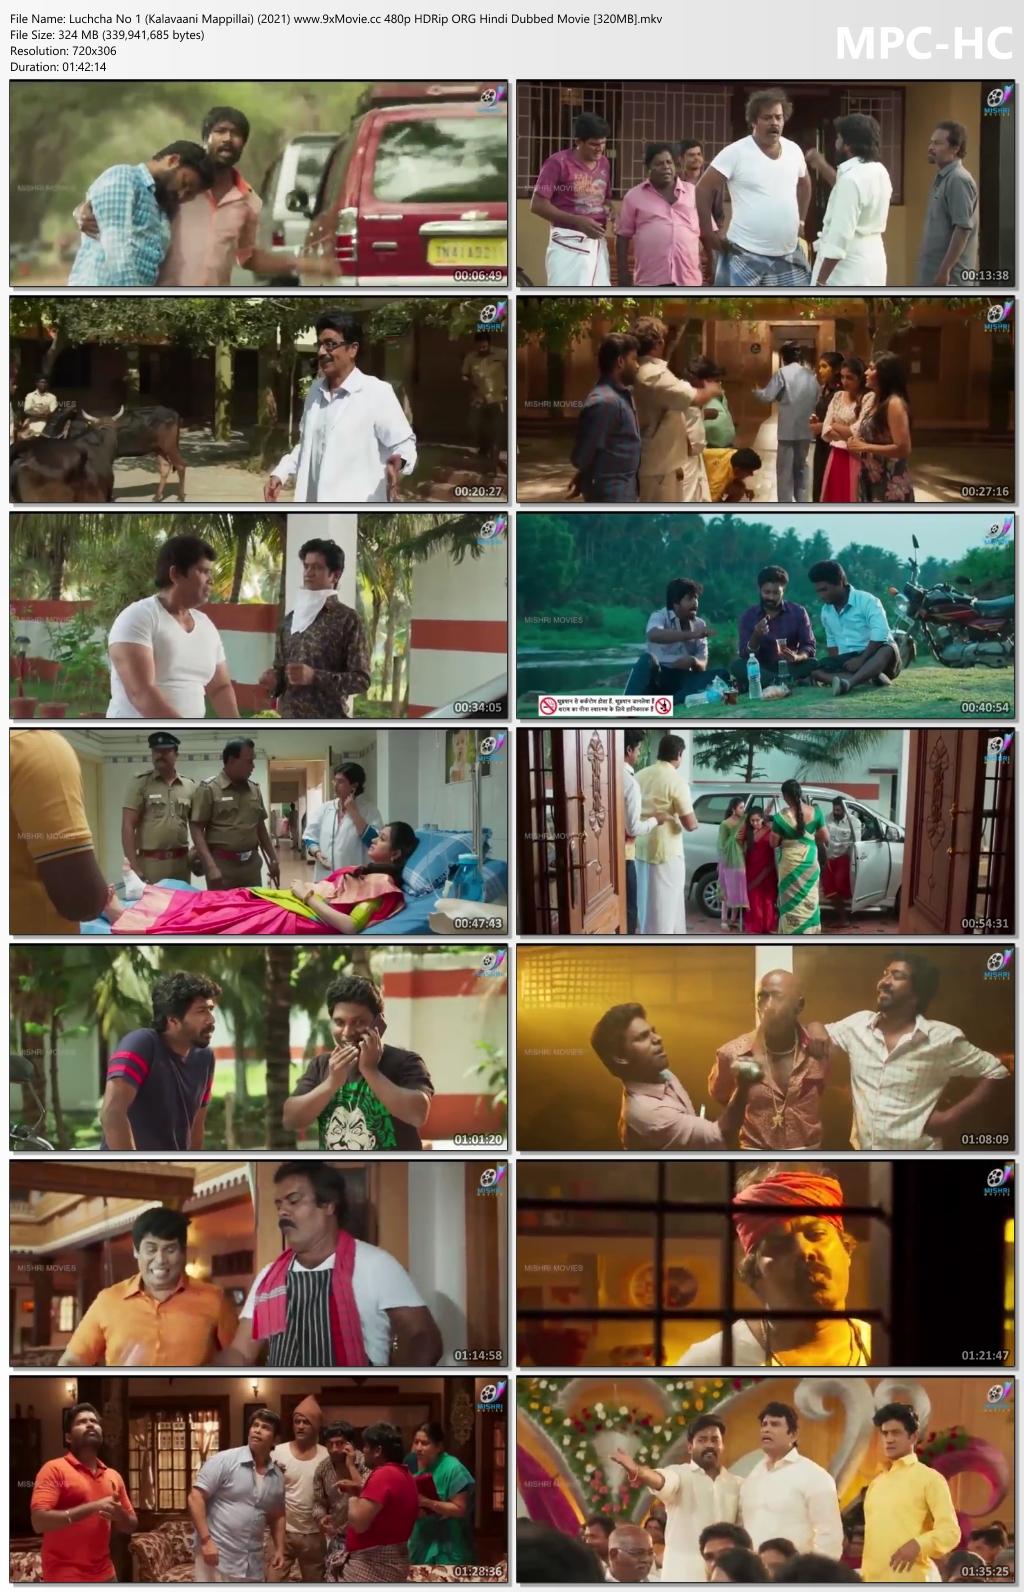 Luchcha-No-1-Kalavaani-Mappillai-2021-www-9x-Movie-cc-480p-HDRip-ORG-Hindi-Dubbed-Movie-320-MB-mkv